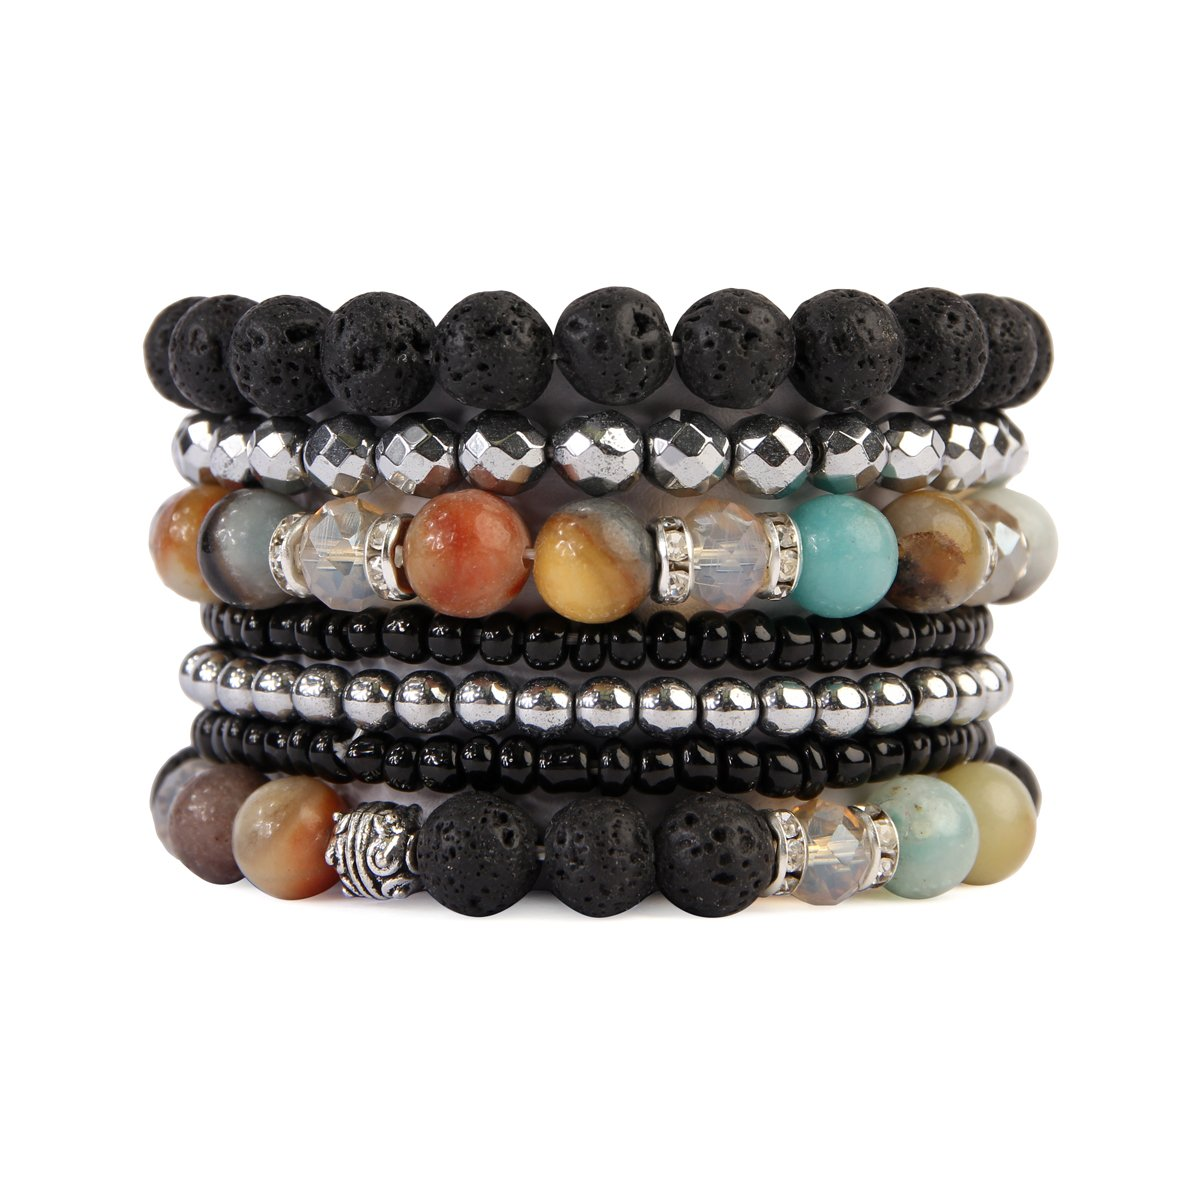 MYS Collection RIAH Fashion Lava Rock Essential Oil Diffuser Stretch Bracelet - Multi Strand Beaded Statement Bangles (Amazonite)